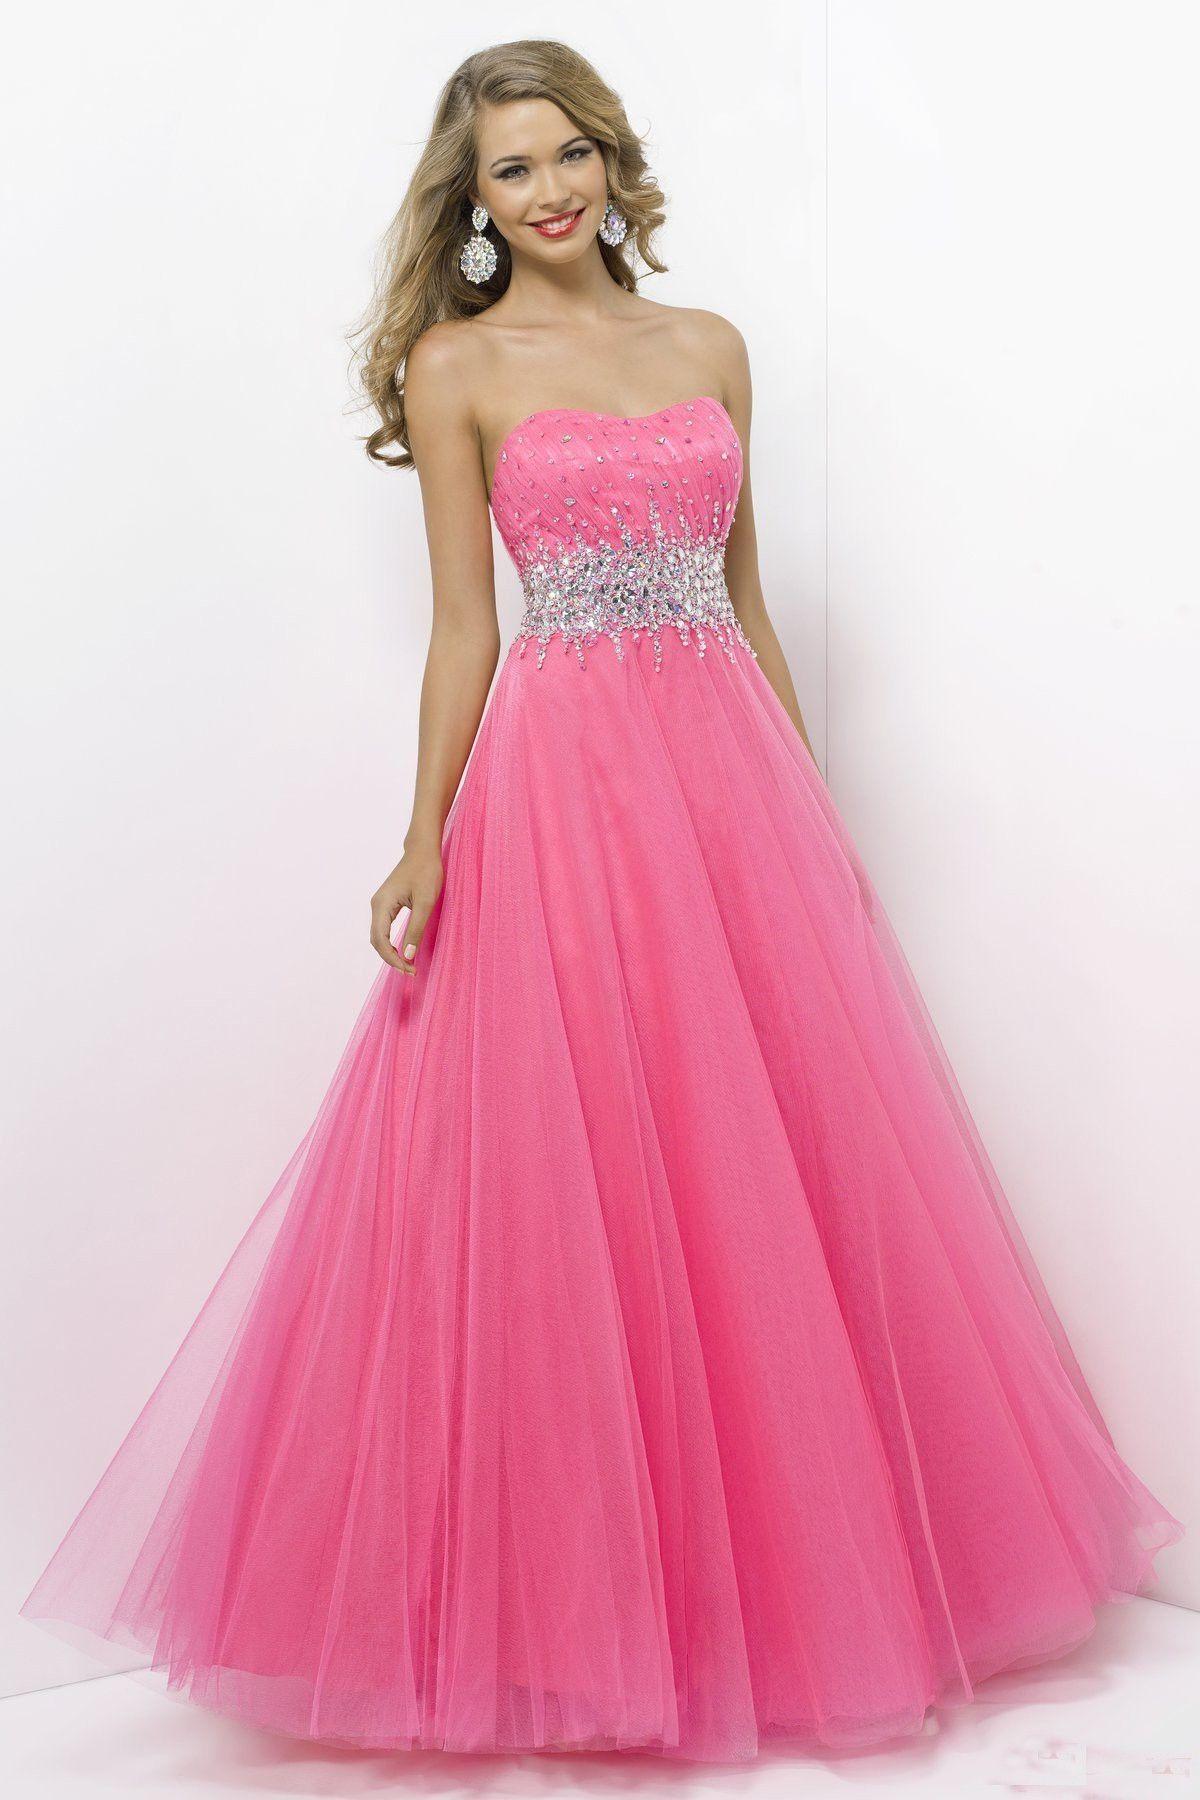 Prom dresses prom dresses for teens prom dresses long strapless